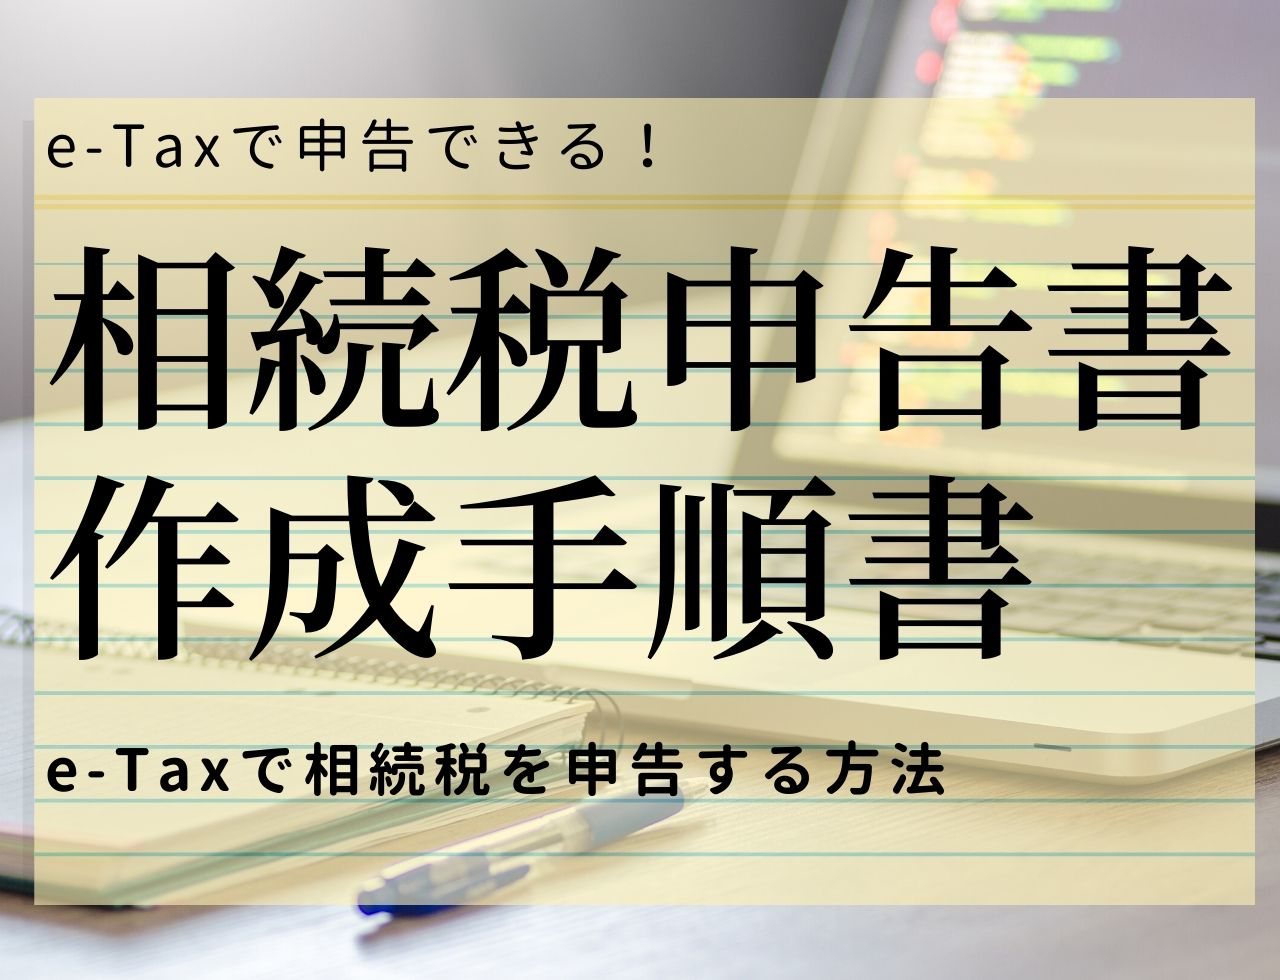 e-Tax相続税申告書作成手順